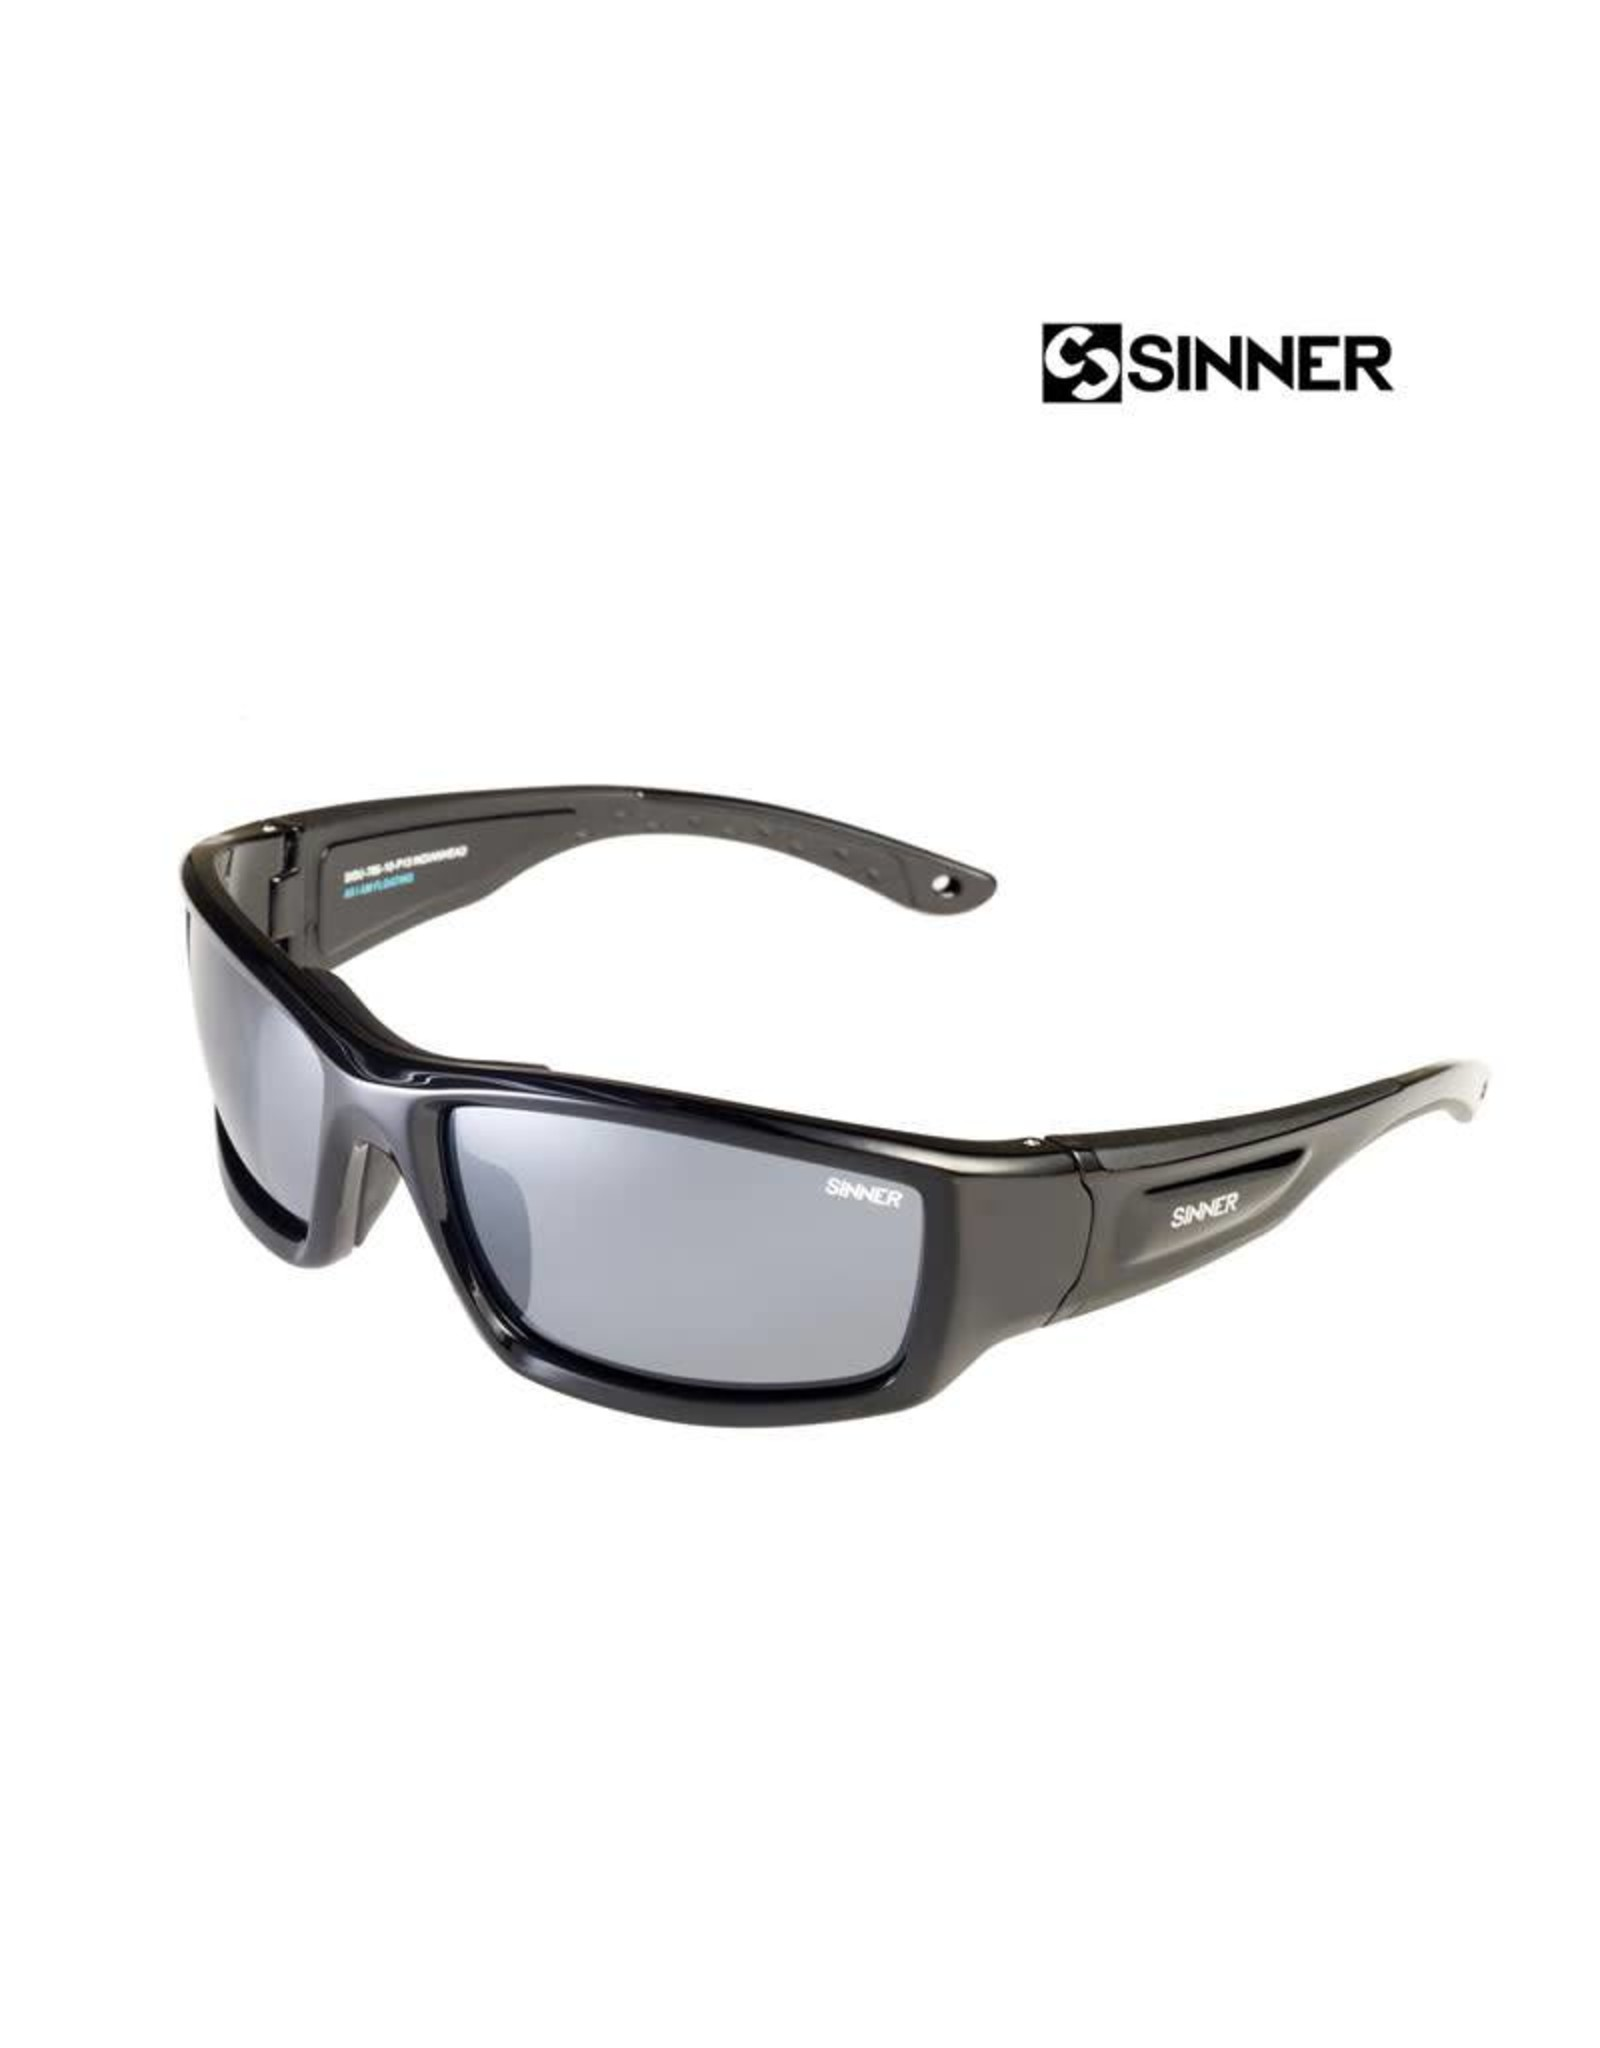 SINNER SINNER Indianhead Black-Sintec Smoke Zonnebril